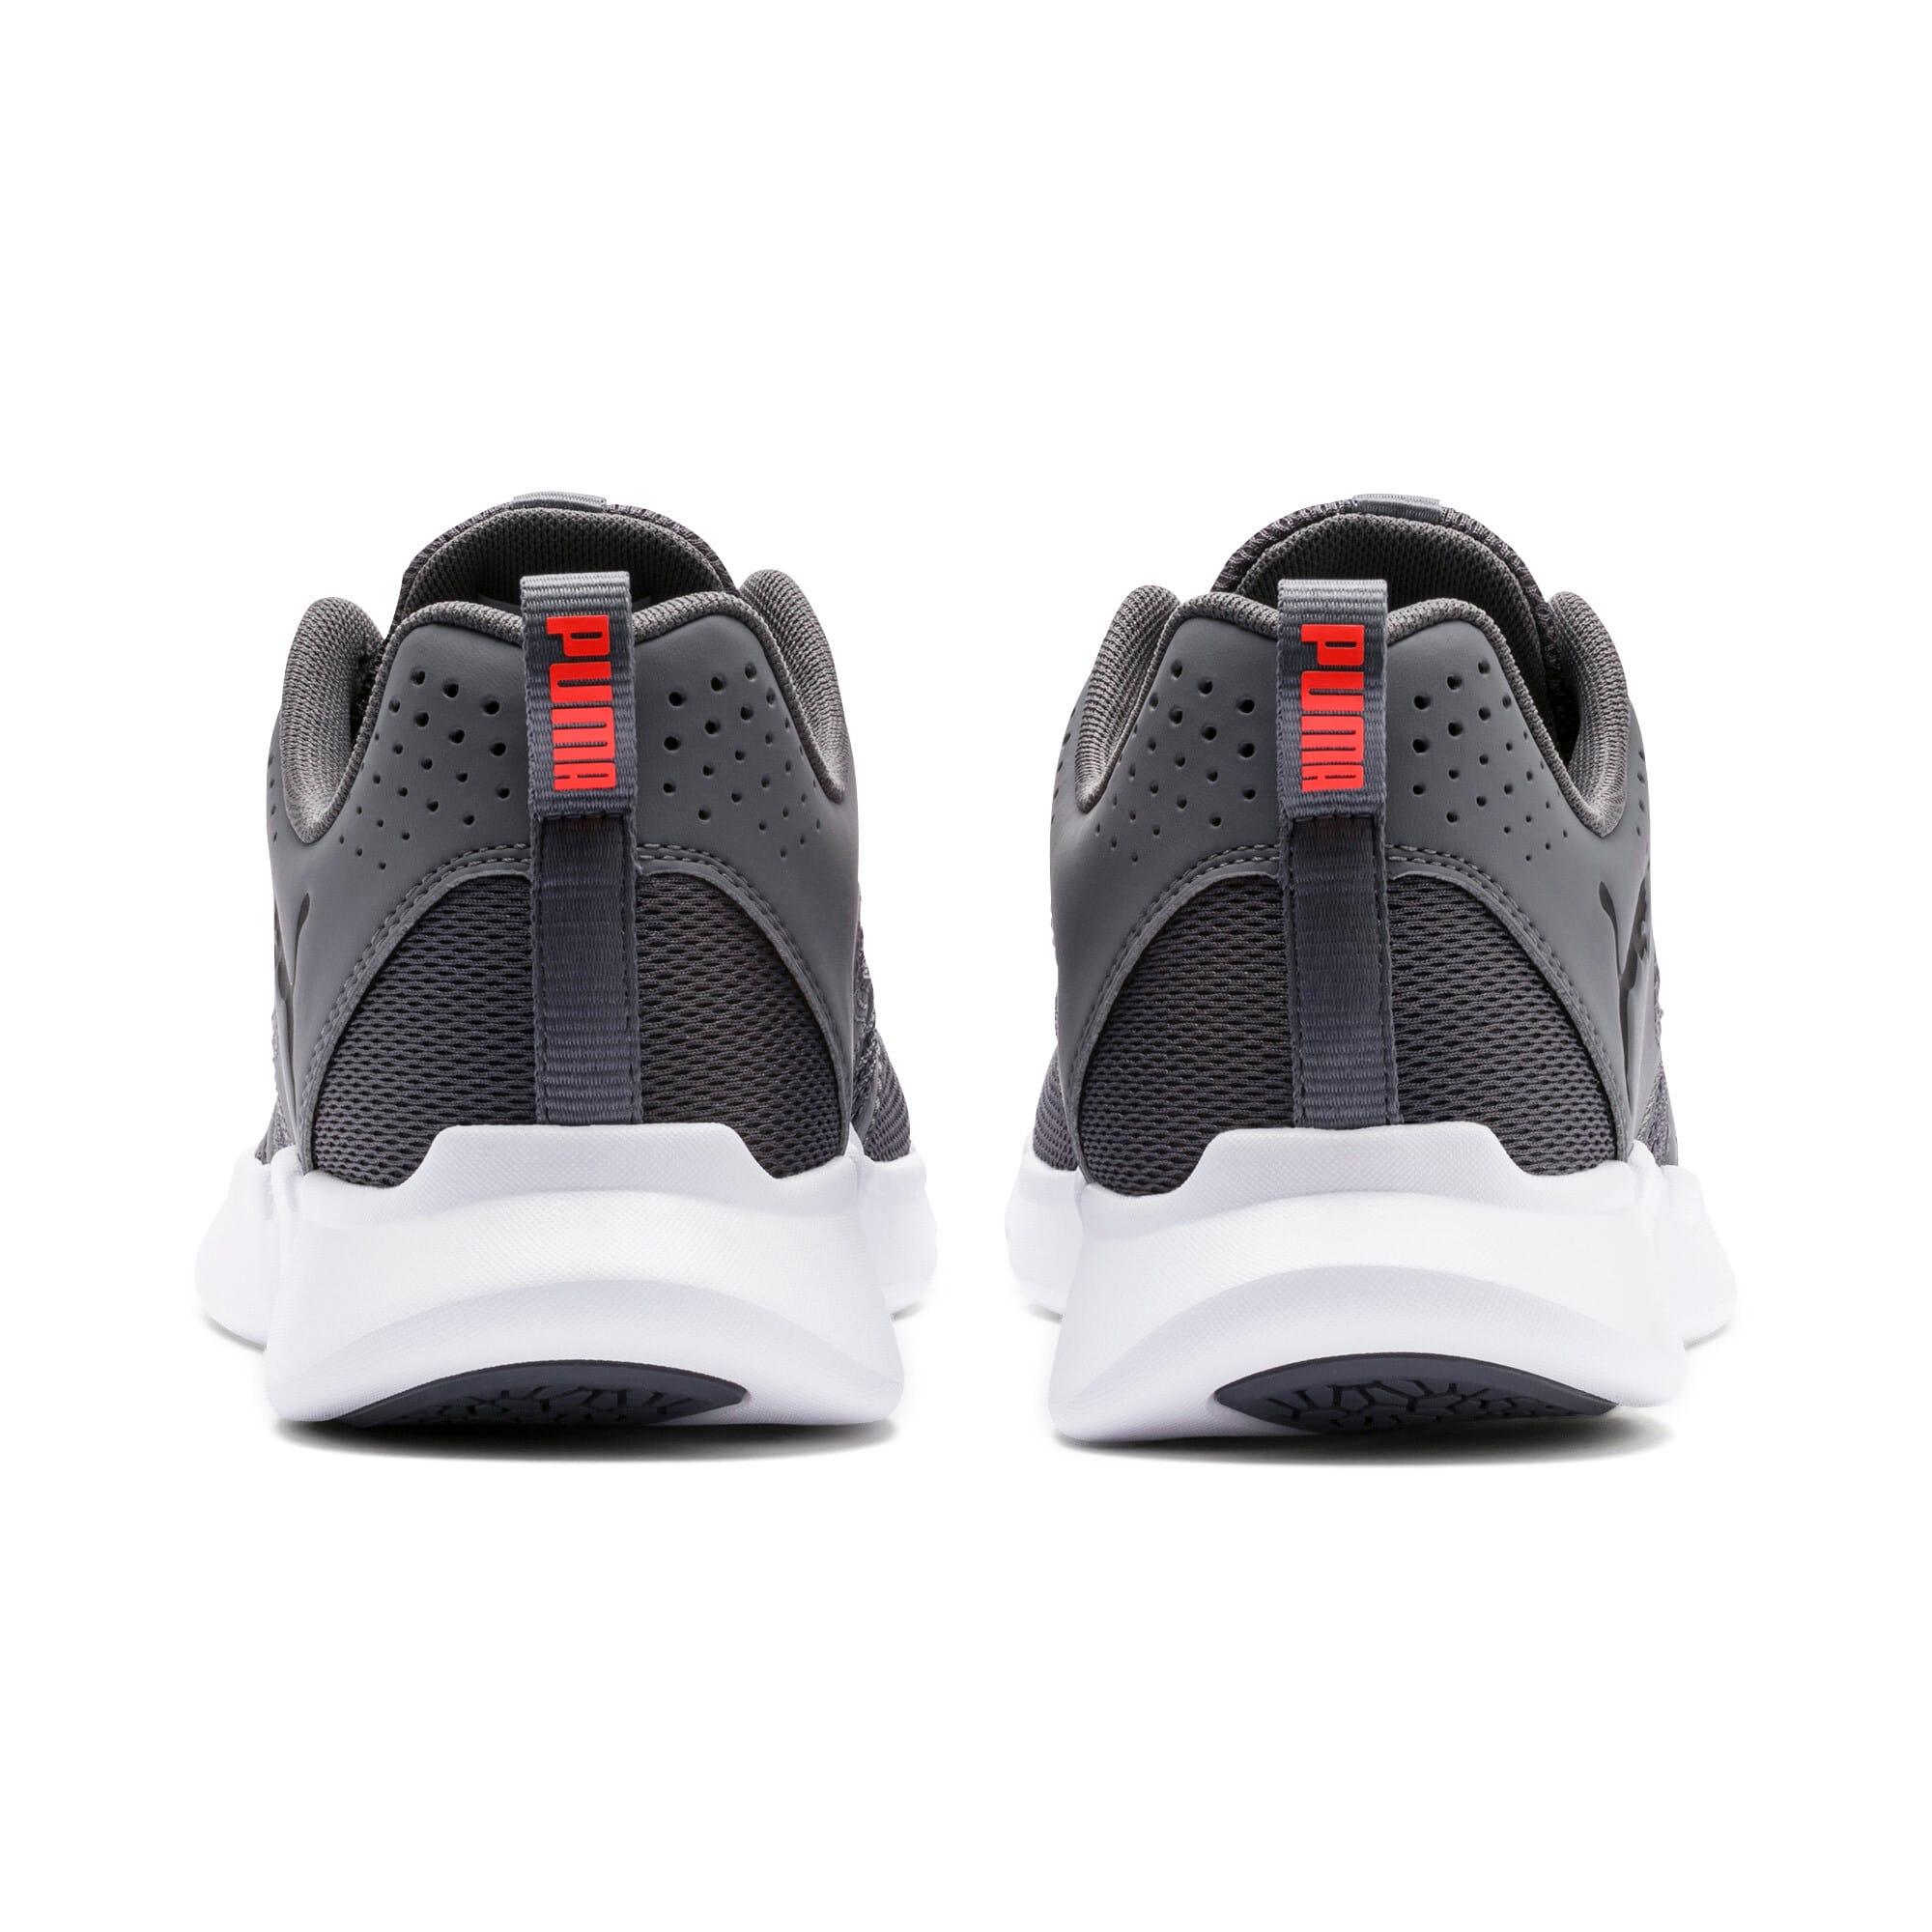 Thumbnail 5 of INTERFLEX Modern Sneakers, CASTLEROCK-Black-Nrgy Red, medium